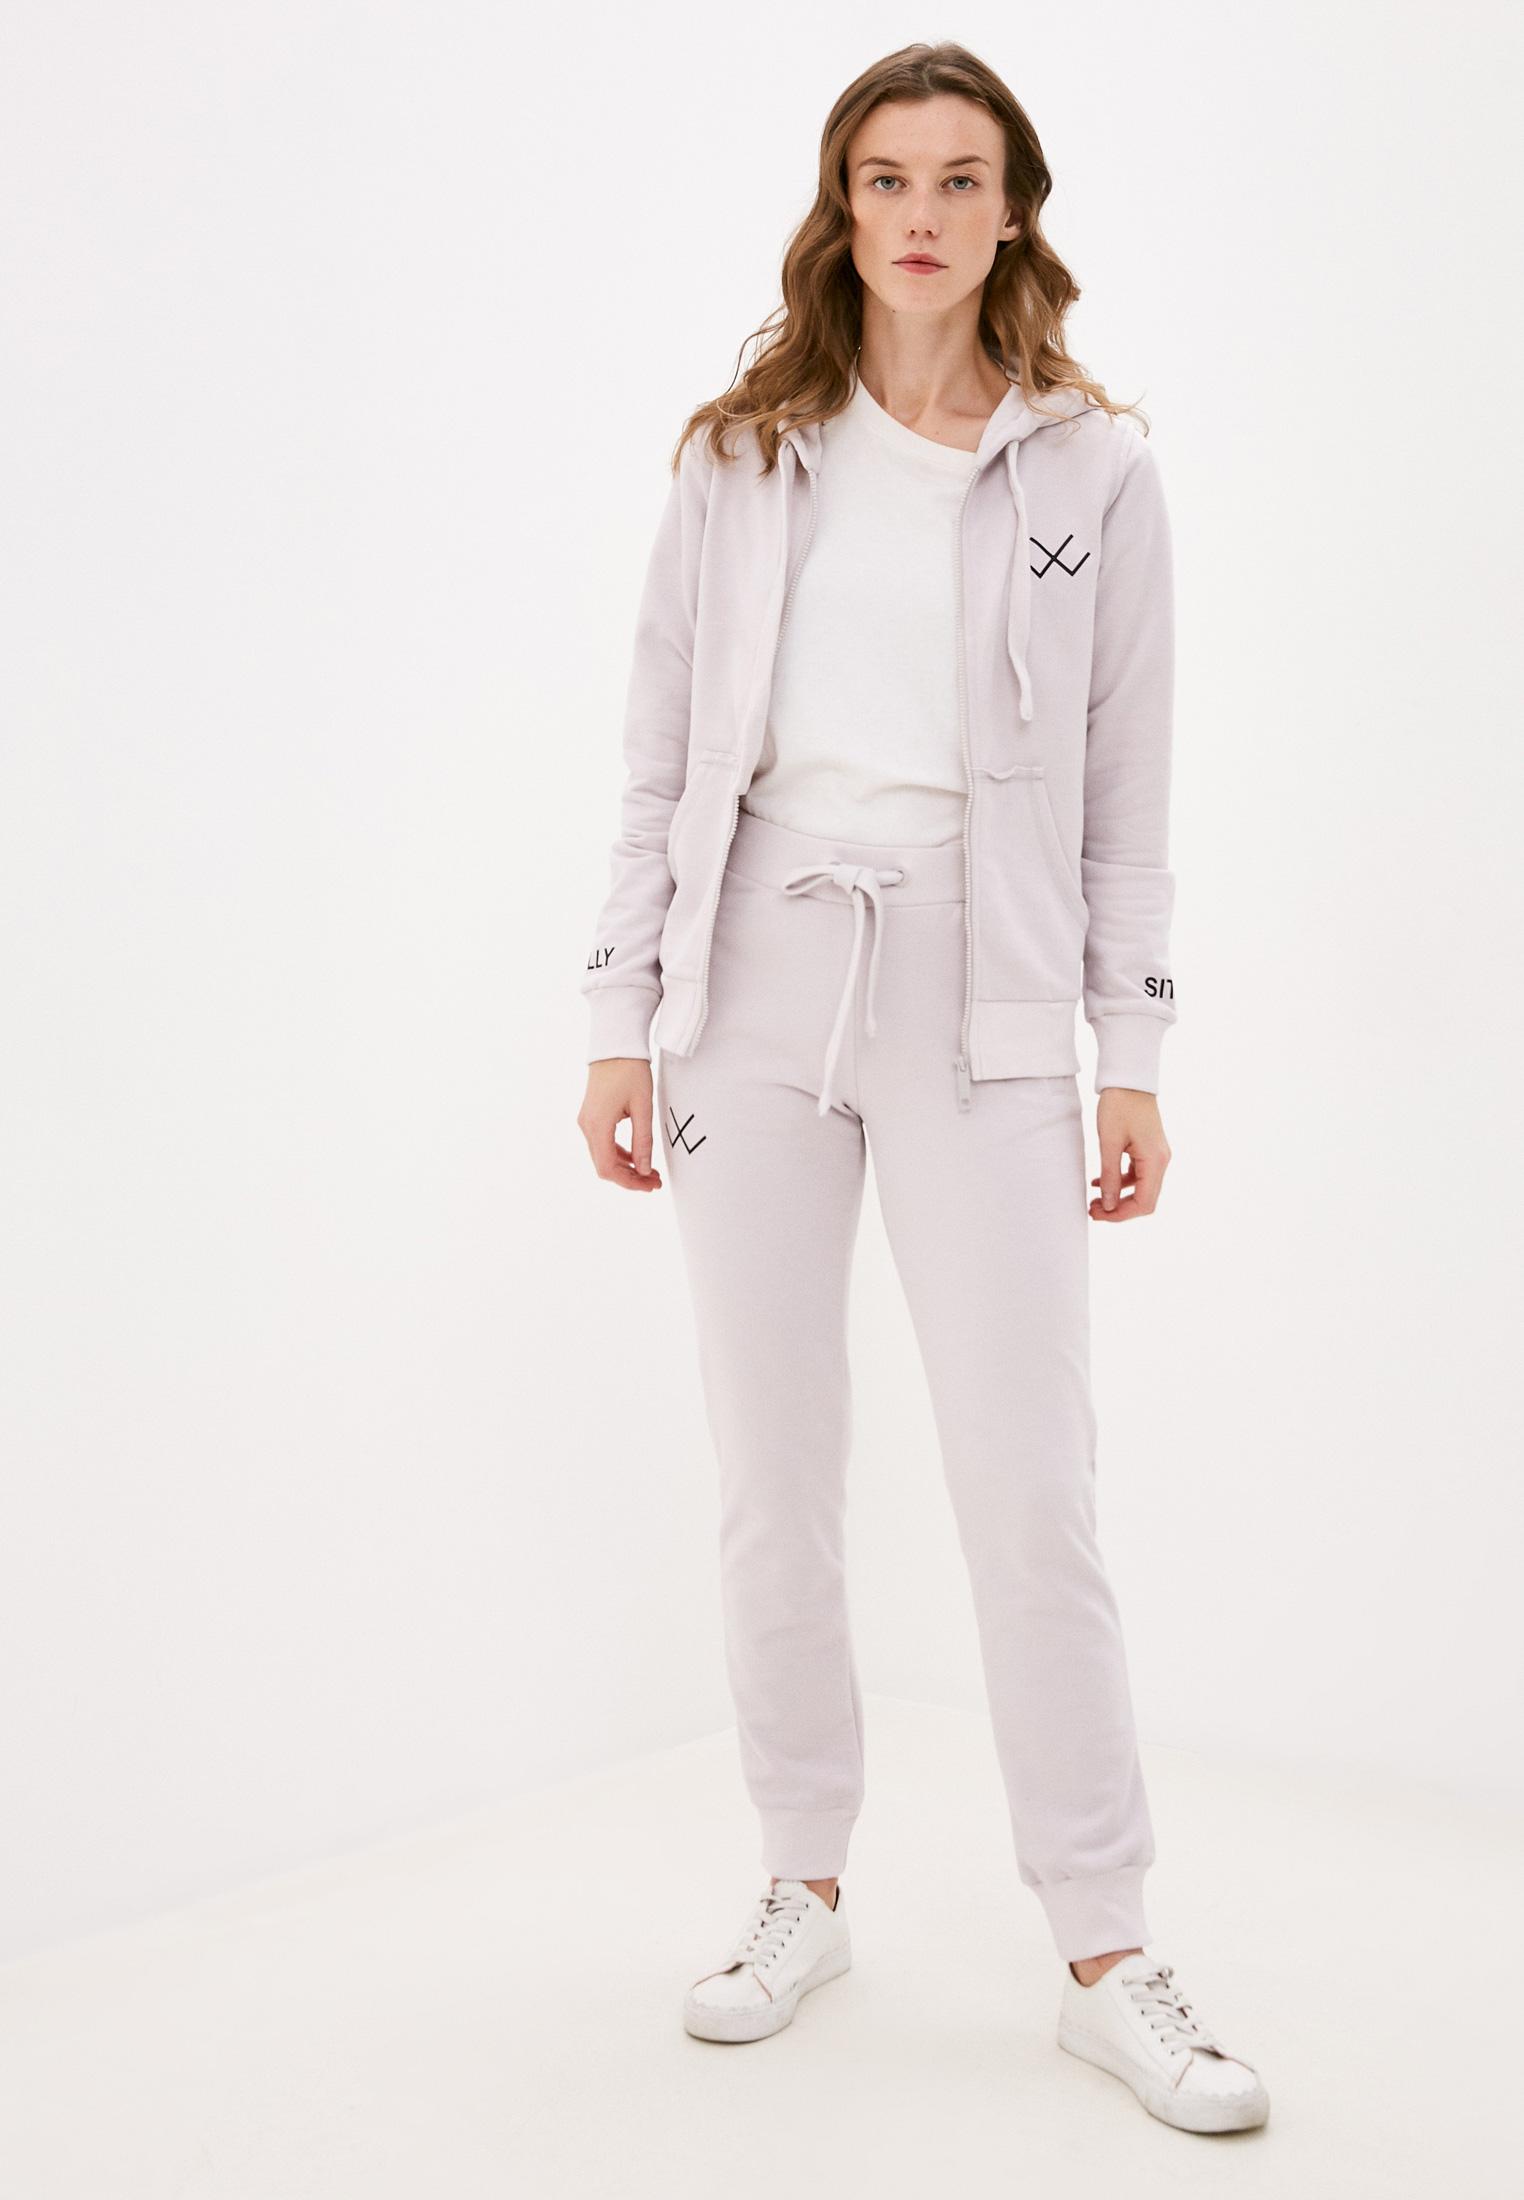 Спортивный костюм Sitlly 20363